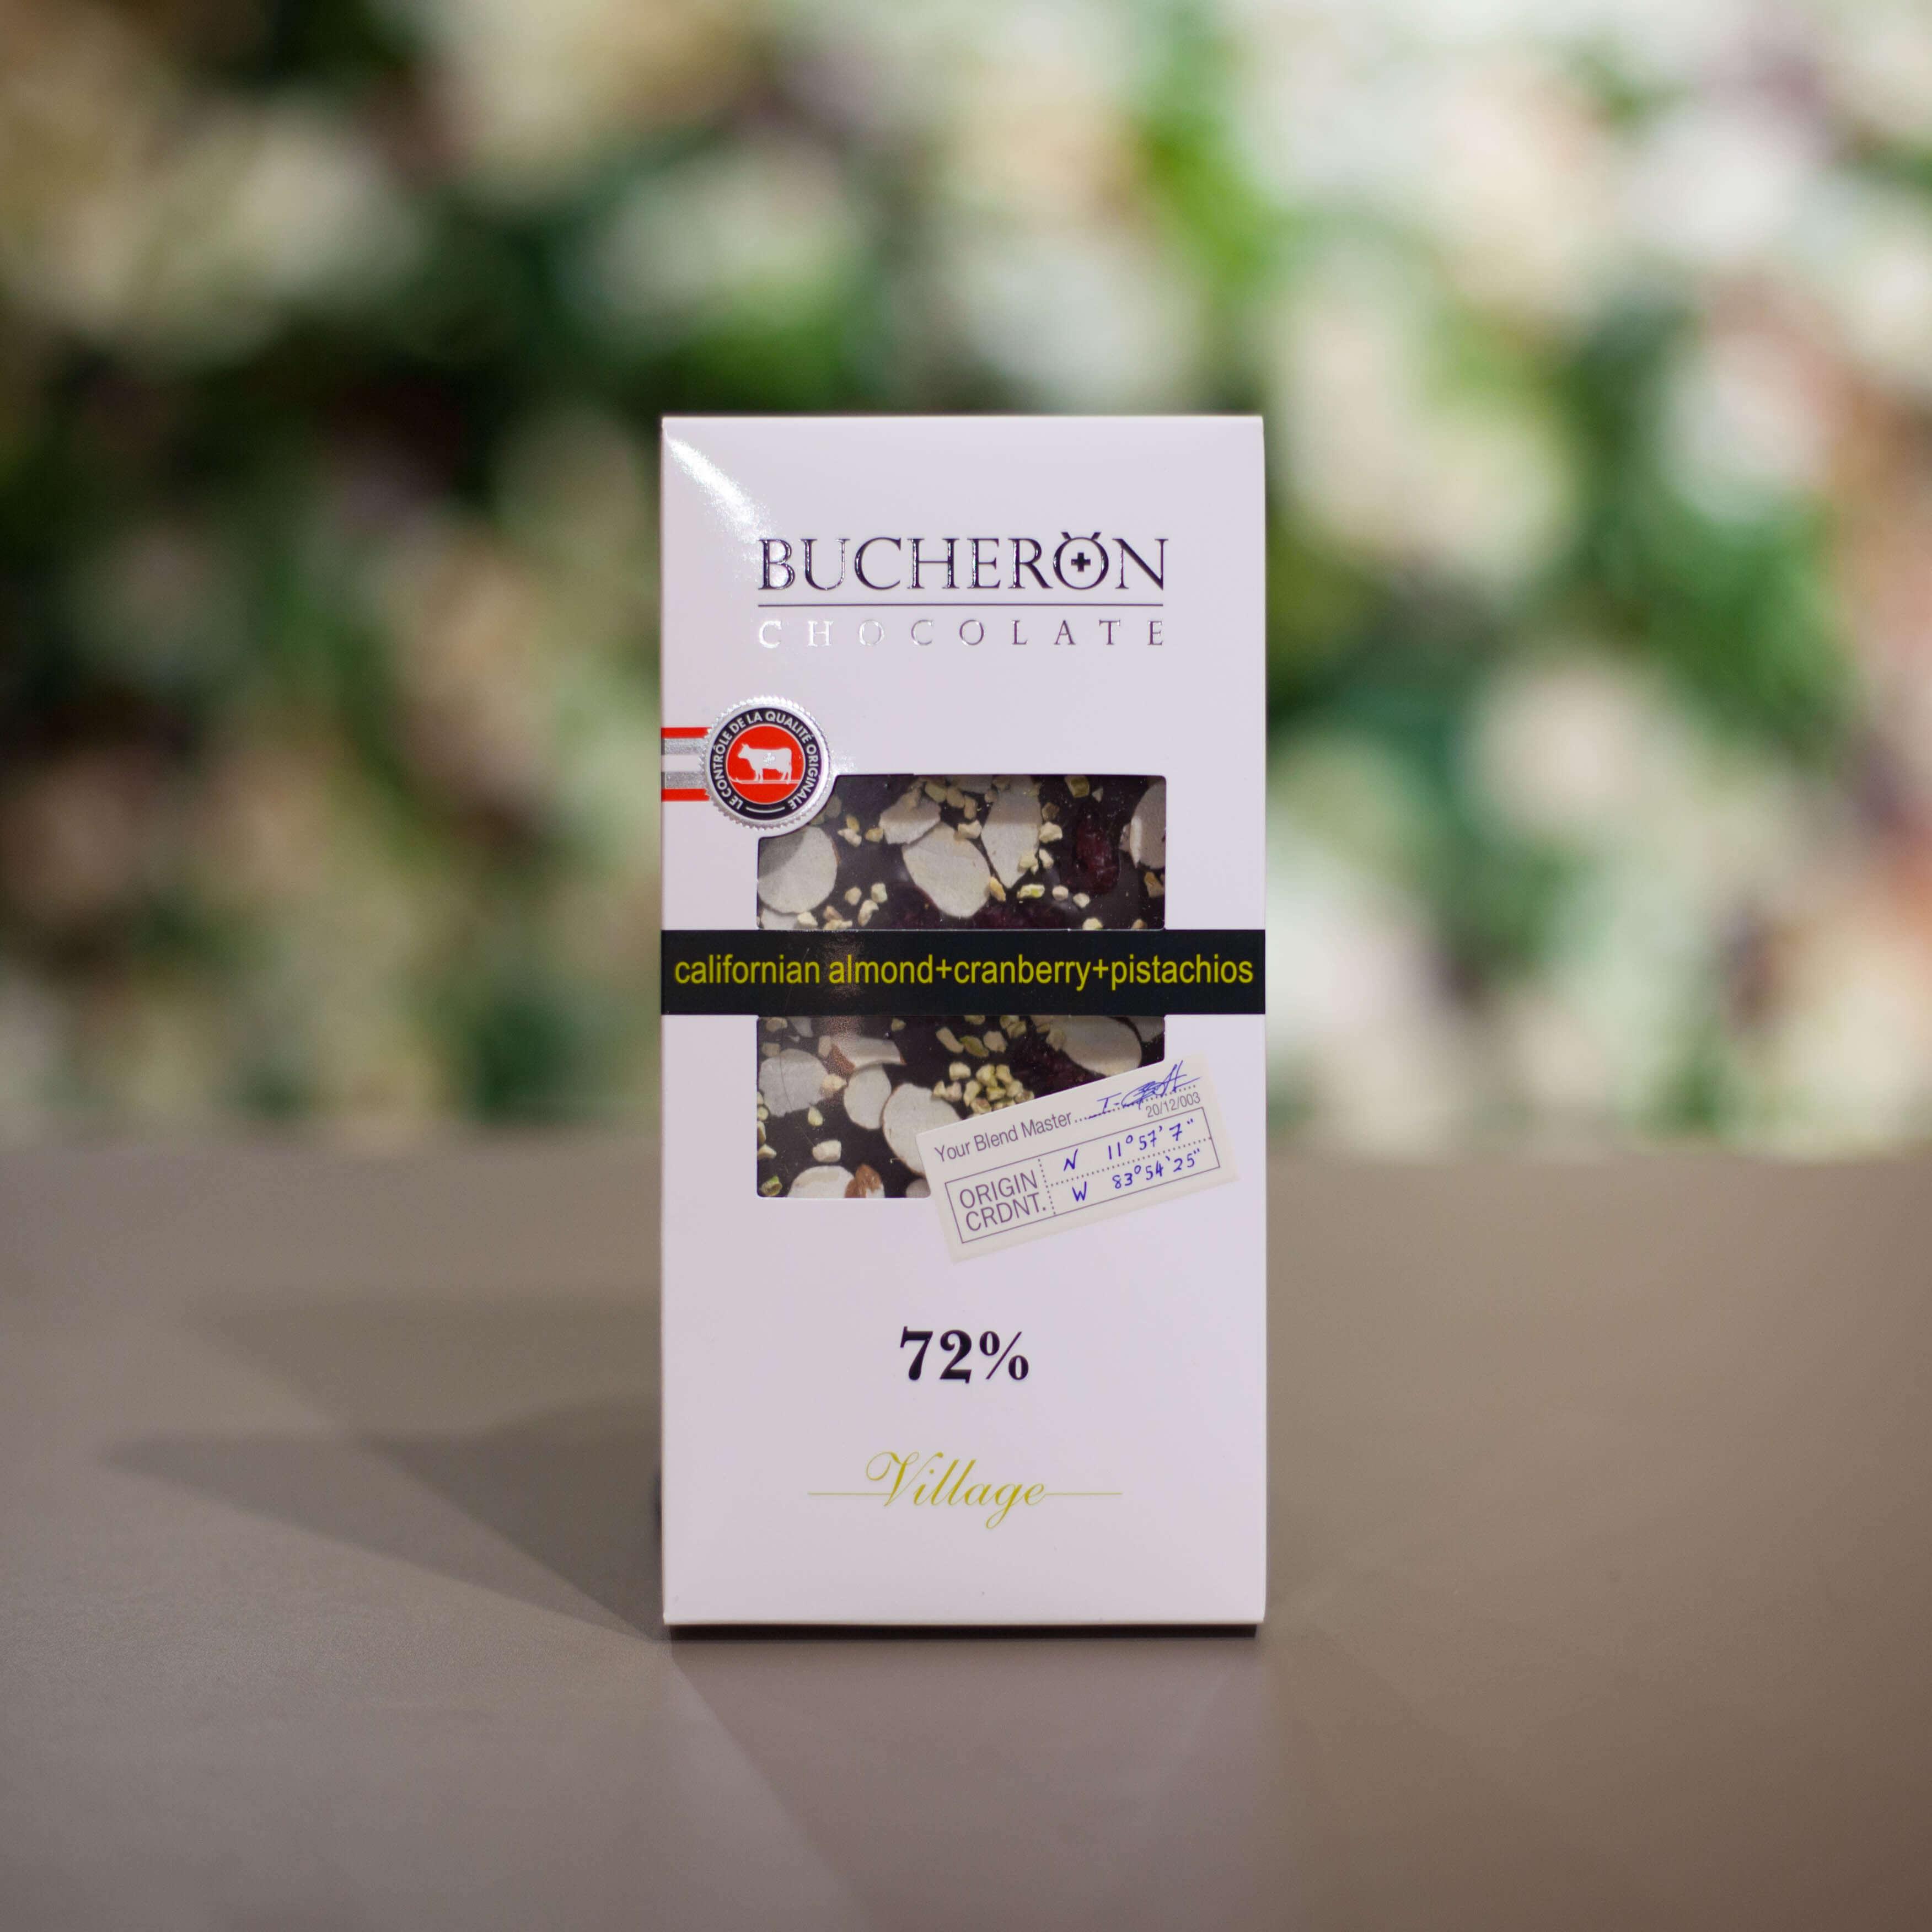 Шоколад BUCHERON с миндалем, клюквой и фисташками 100 гр. фото